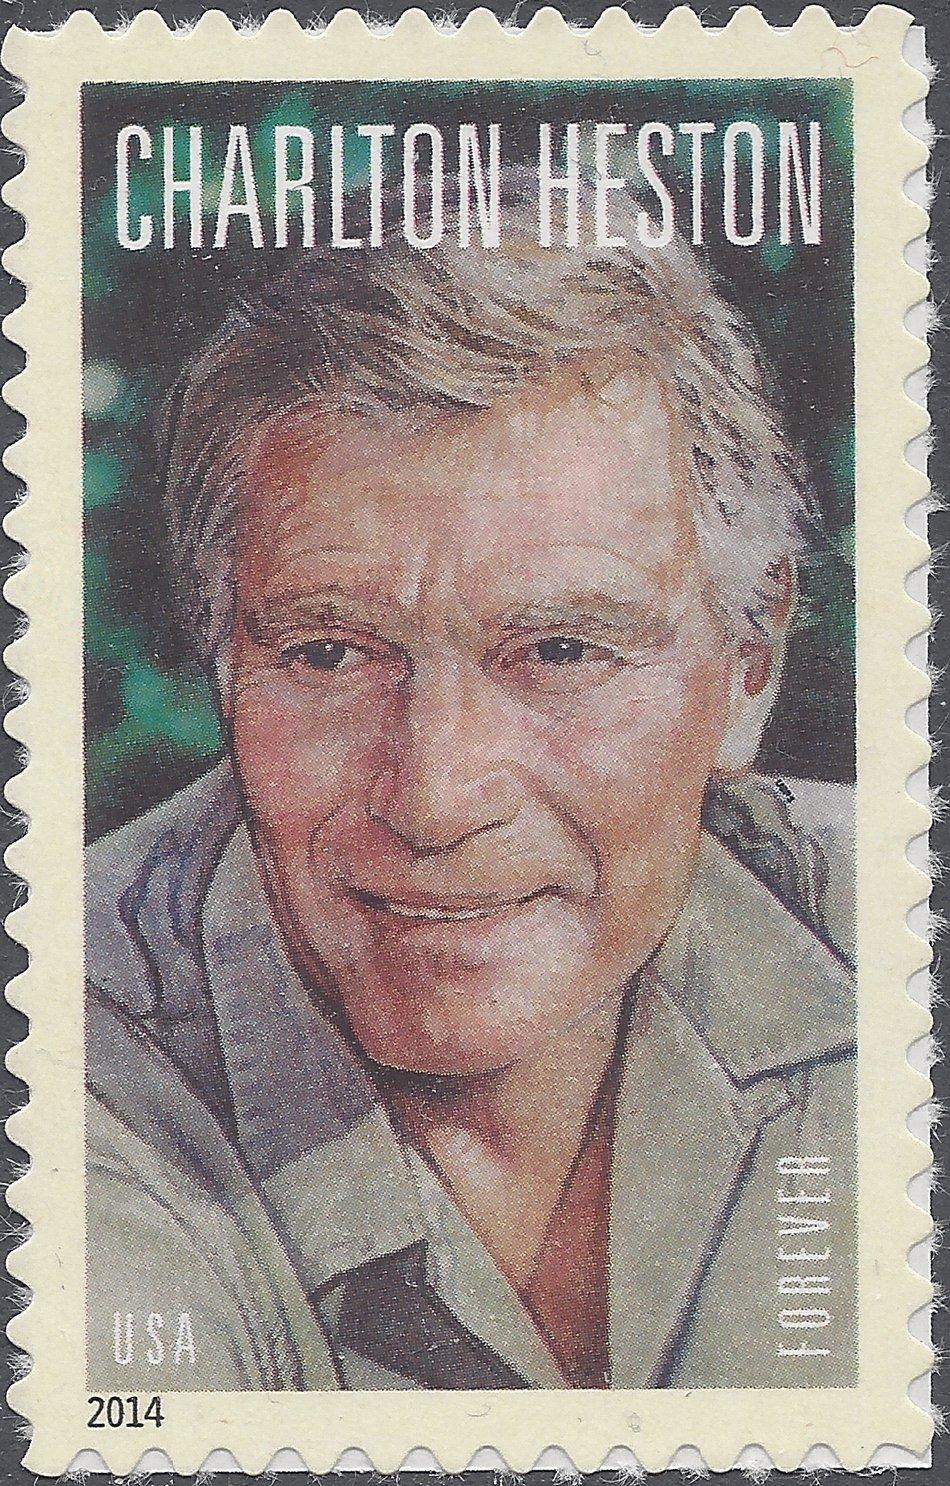 #4892 (49c Forever) Legends of Hollywood Charlton Heston MNH